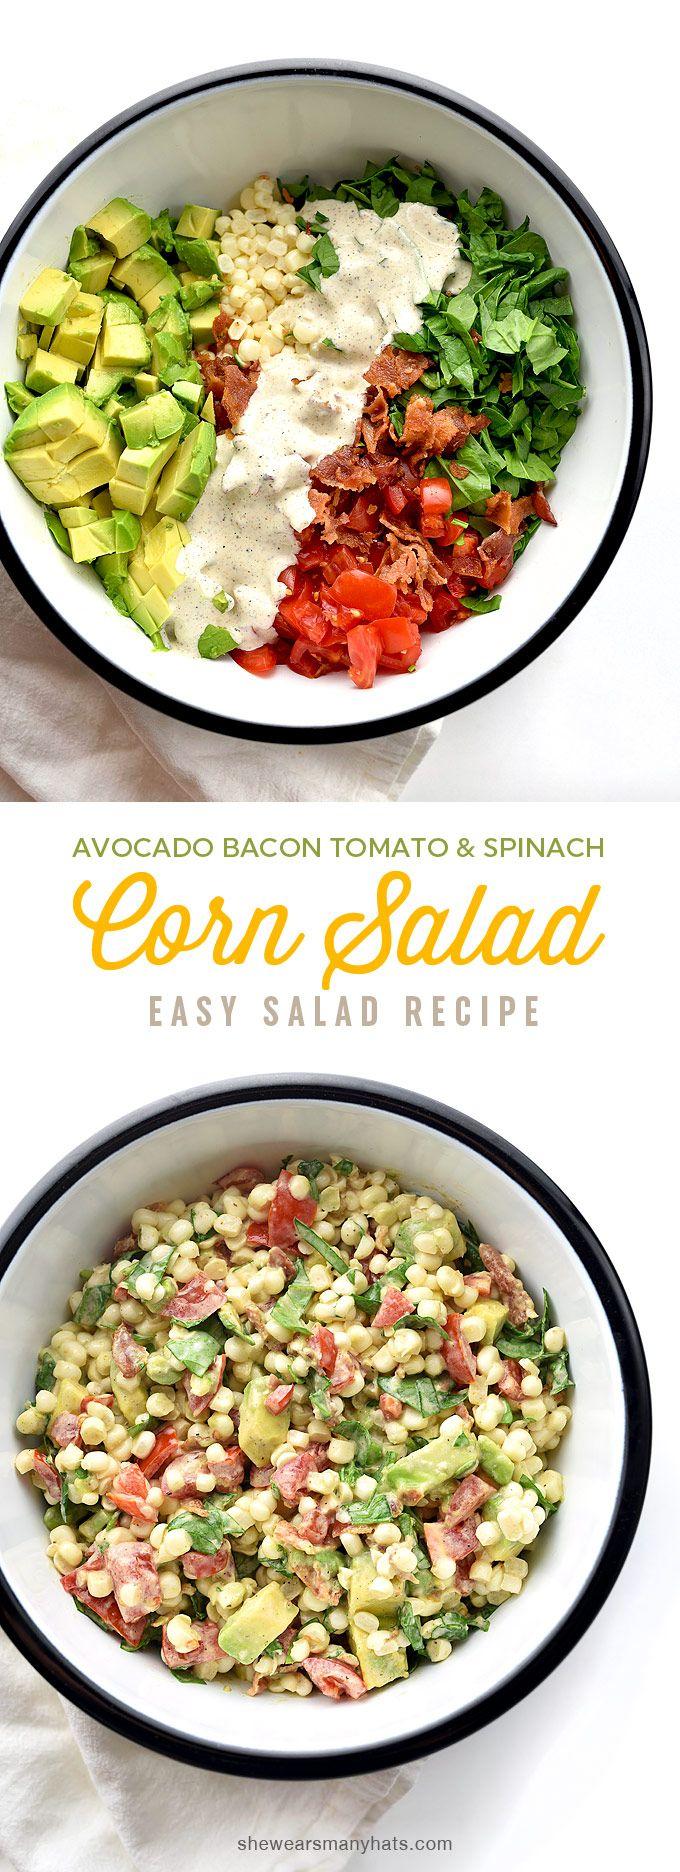 Avocado Bacon Tomato Spinach Corn Salad Recipe